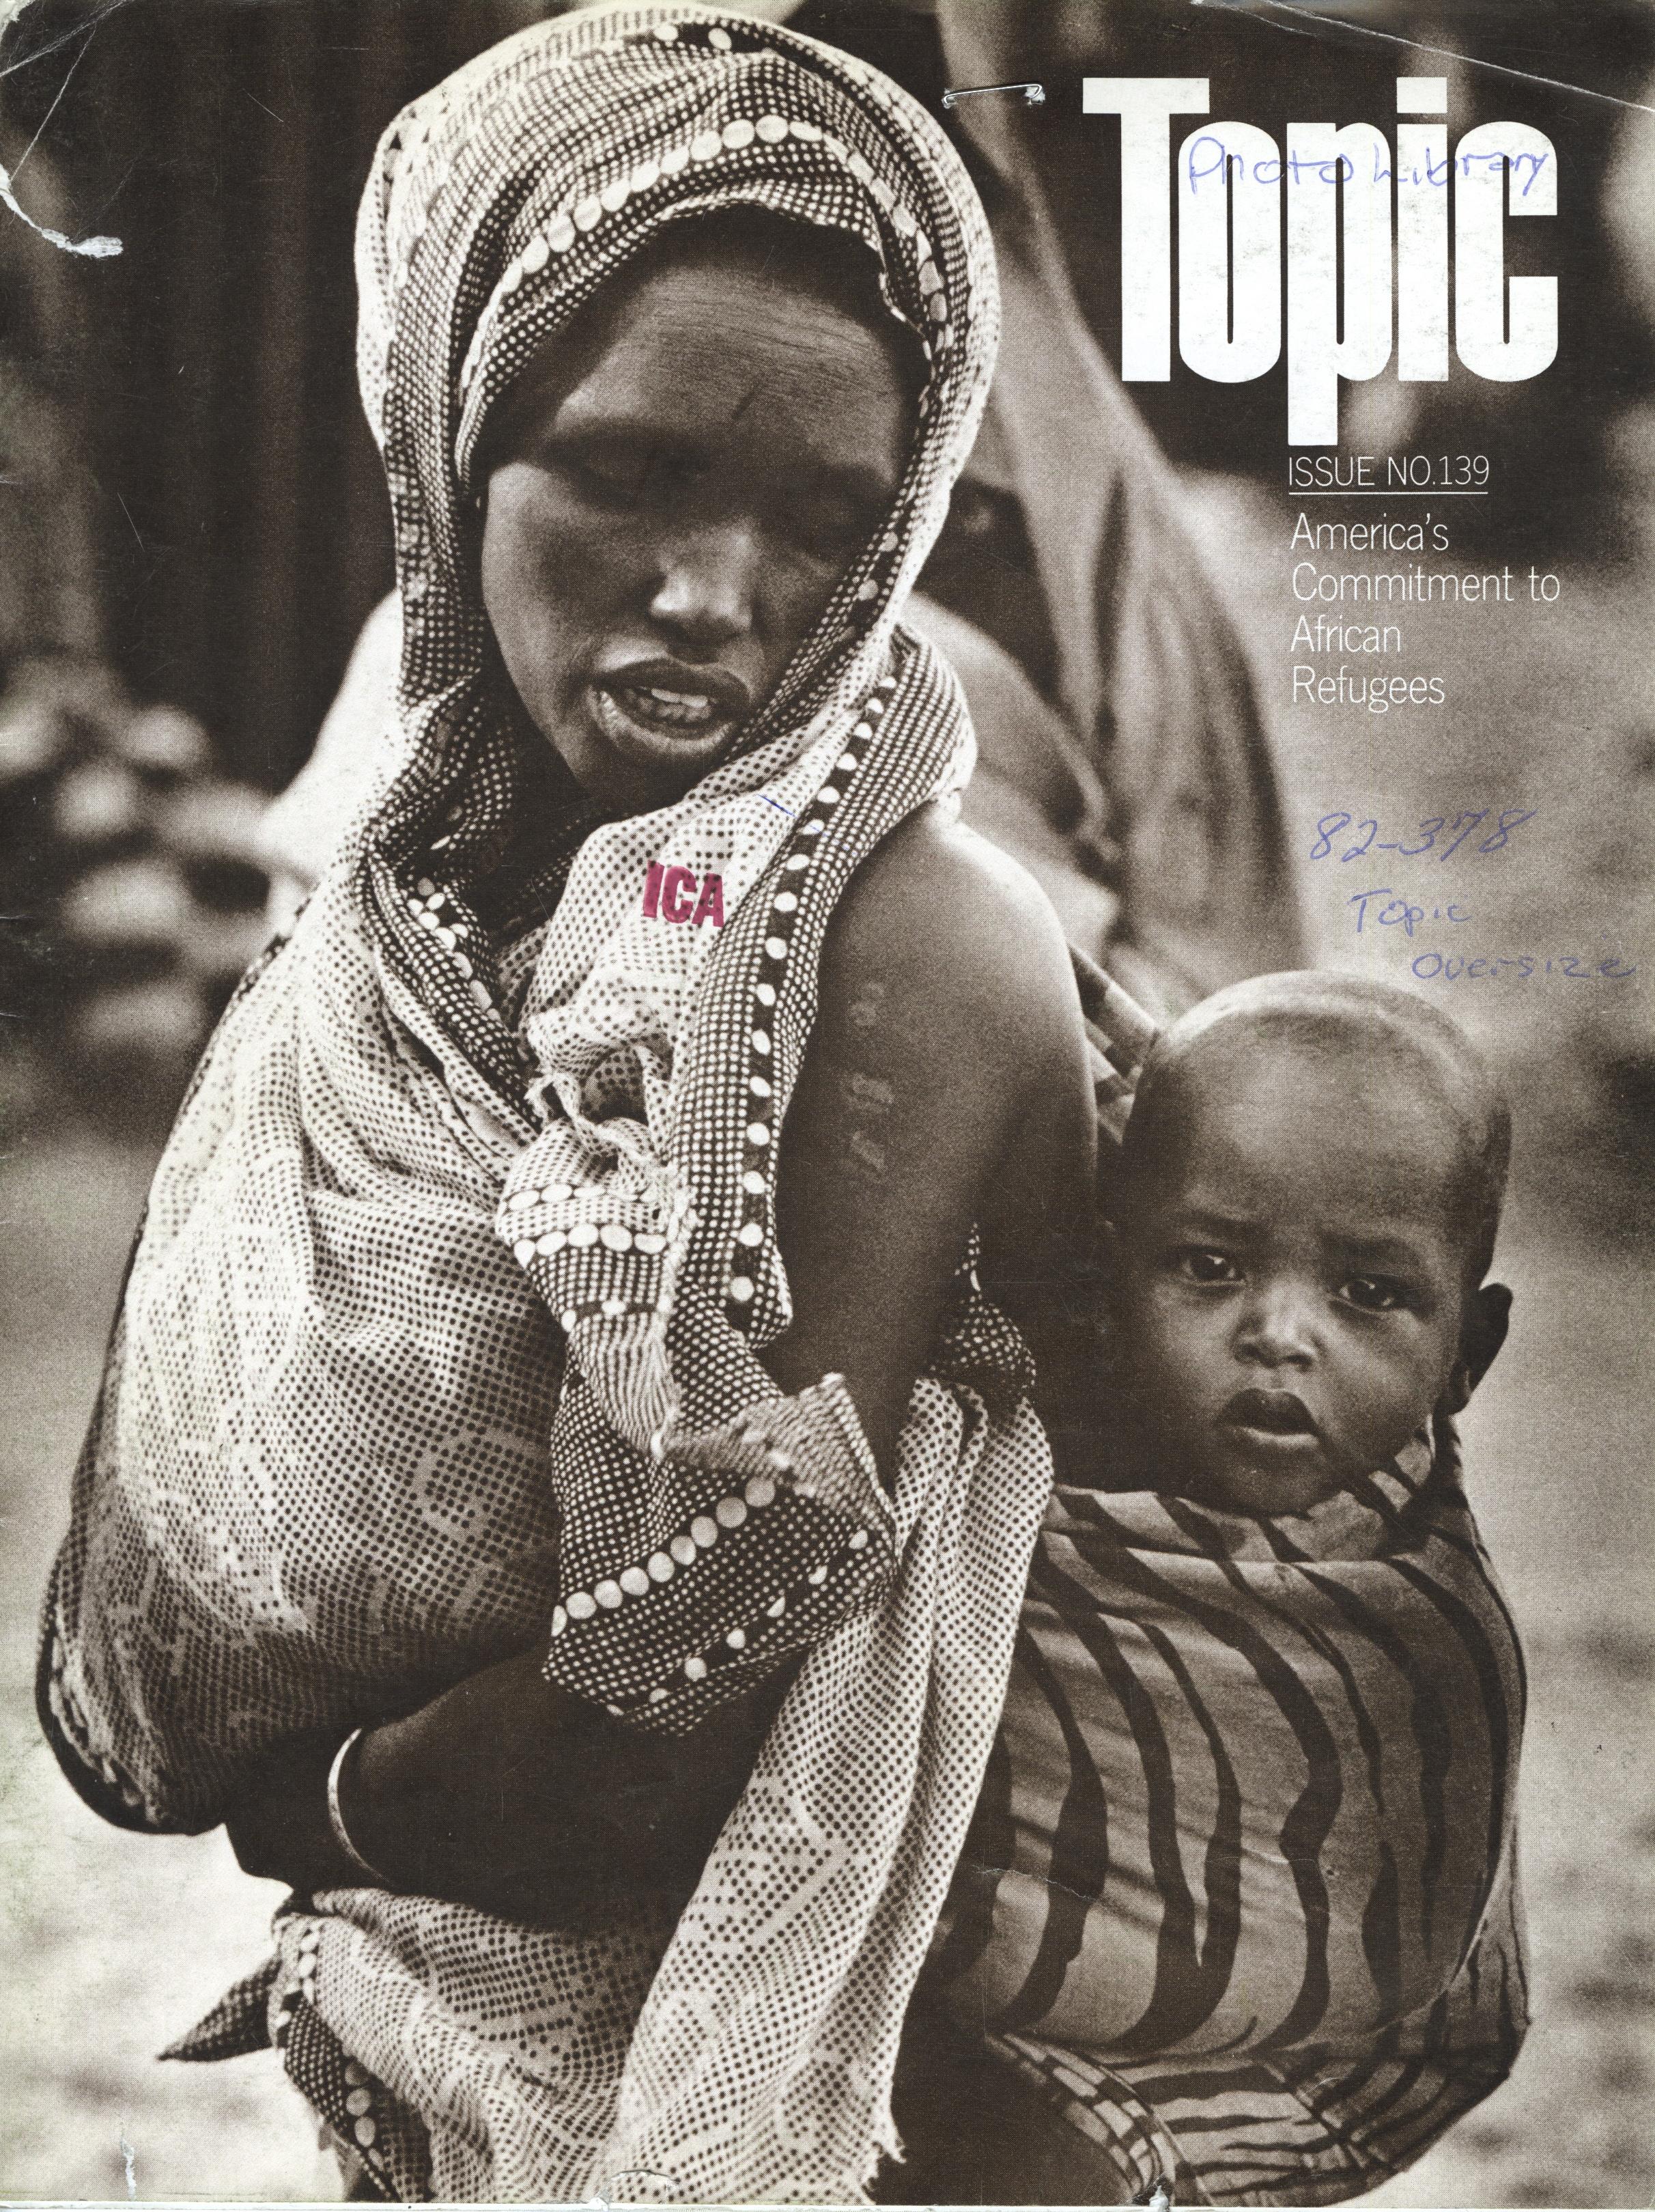 Topic Magazine, Issue 139